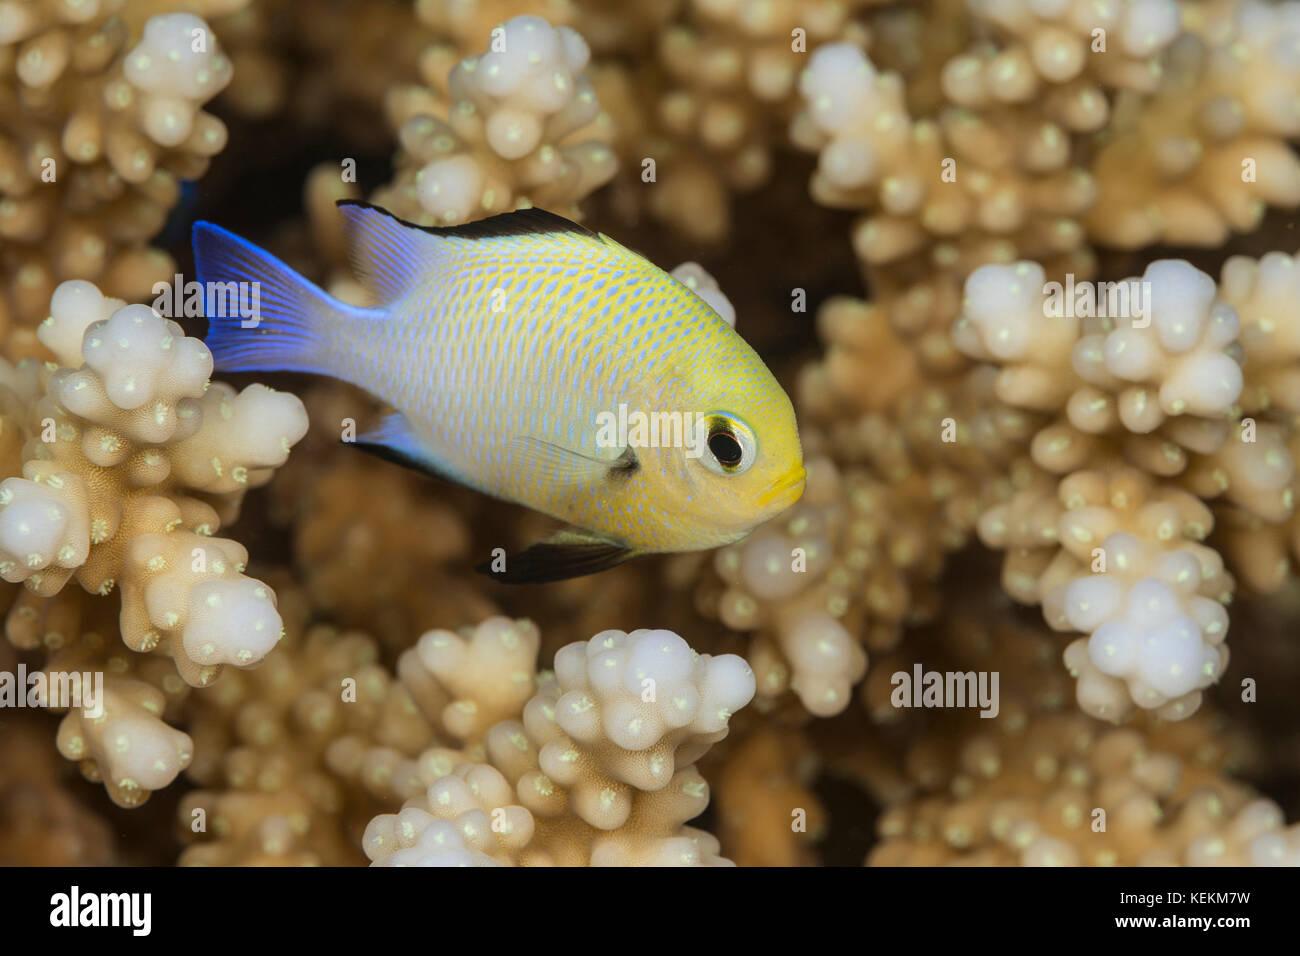 La demi-lune, demoiselle dascyllus marginatus, Marsa Alam, red sea, Egypt Photo Stock